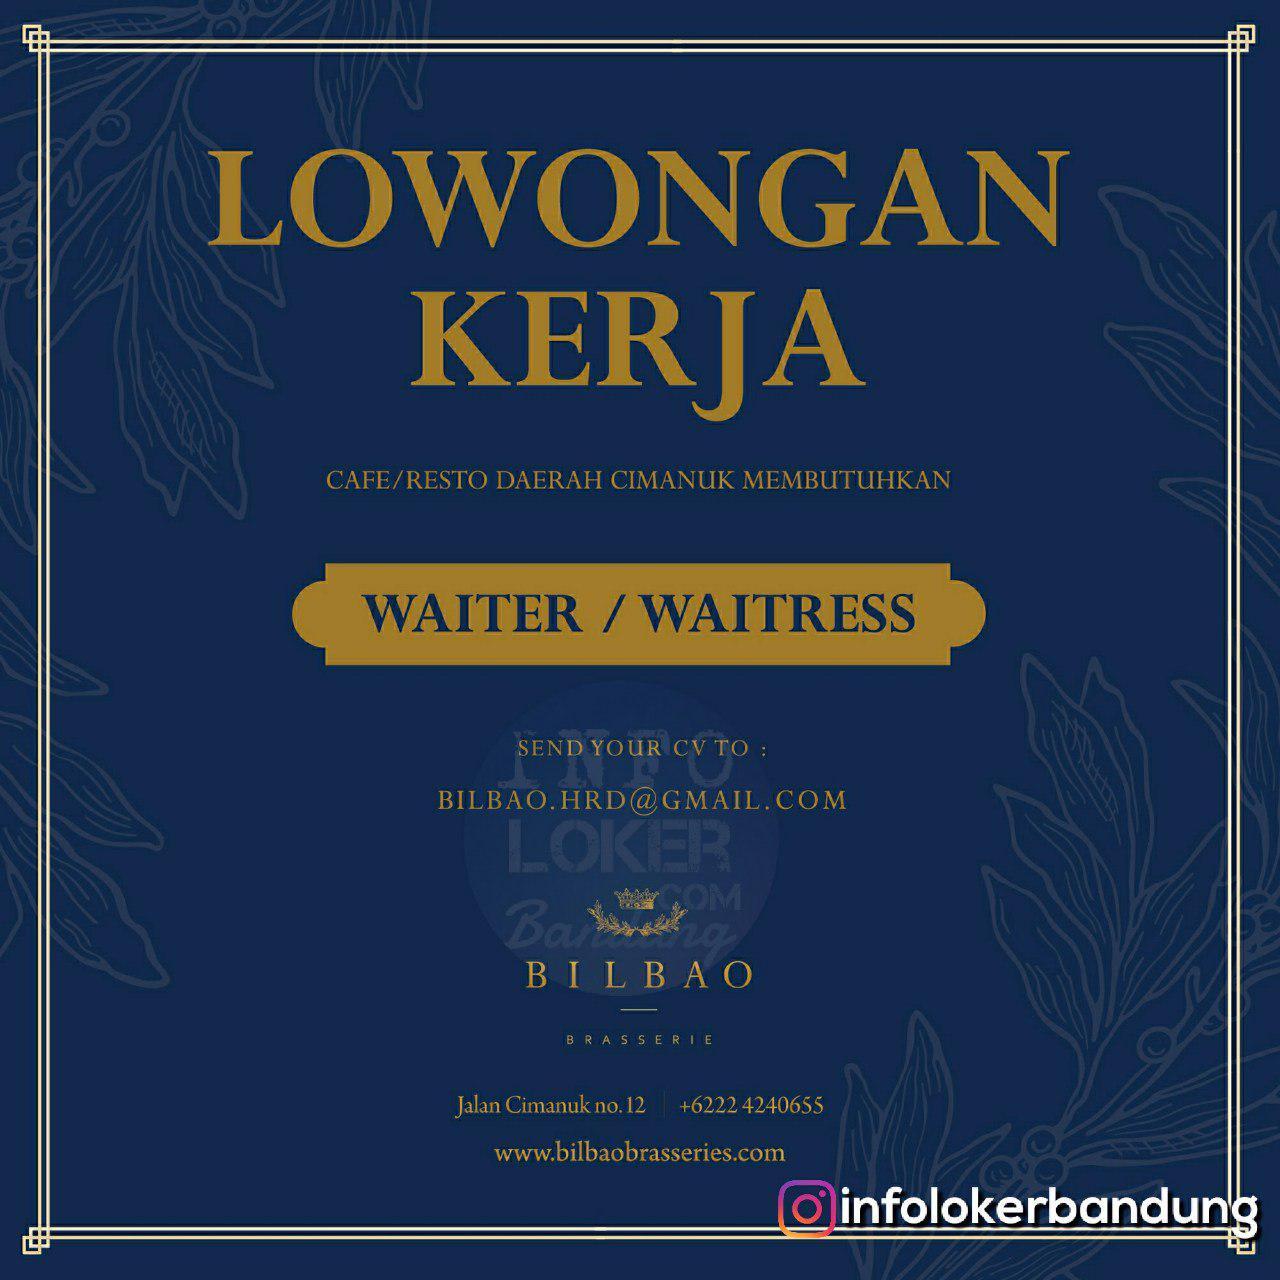 Lowongan Kerja Waiter & Waitress Bilbao Brassiers Cafe & Resto Bandung Agustus 2018